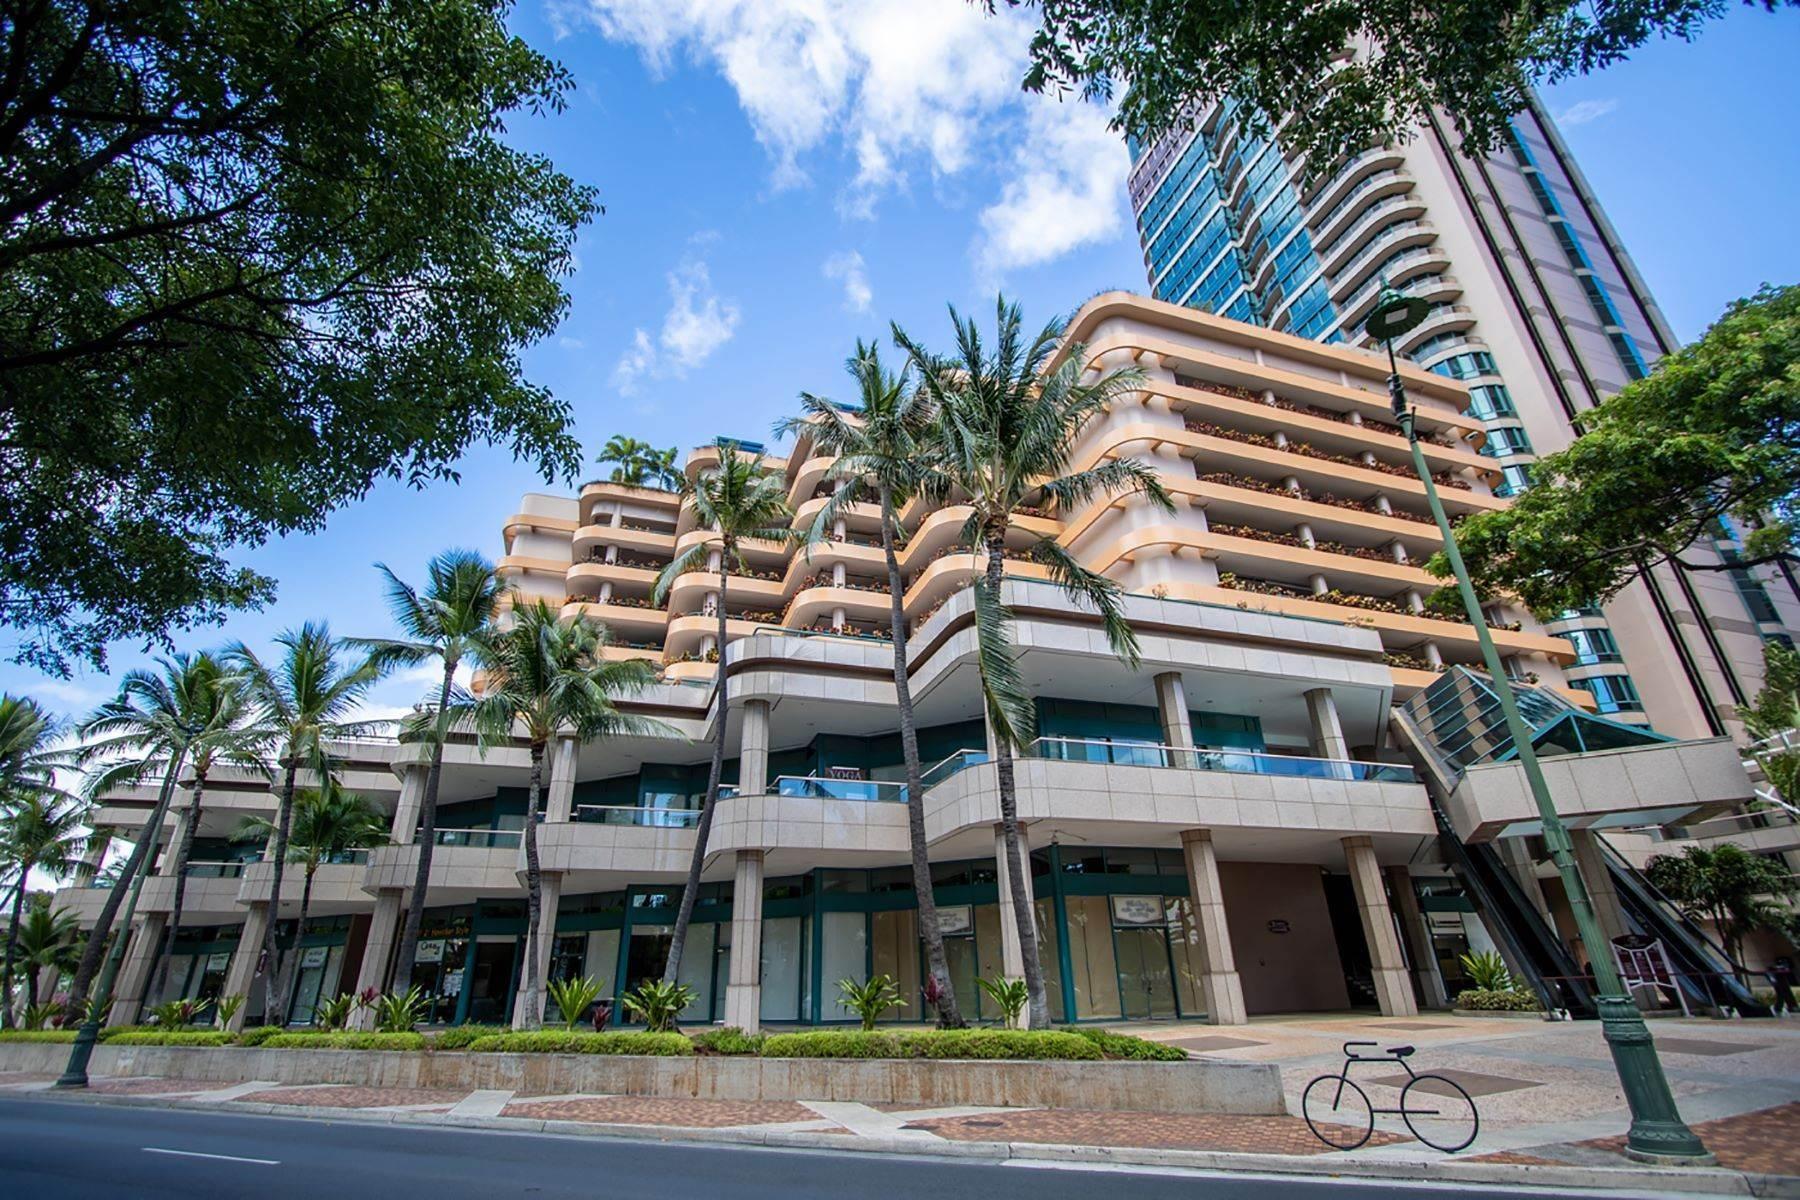 1888 Kalakaua Avenue C307 Honolulu Hawaii 96815 Condominiums For Sale